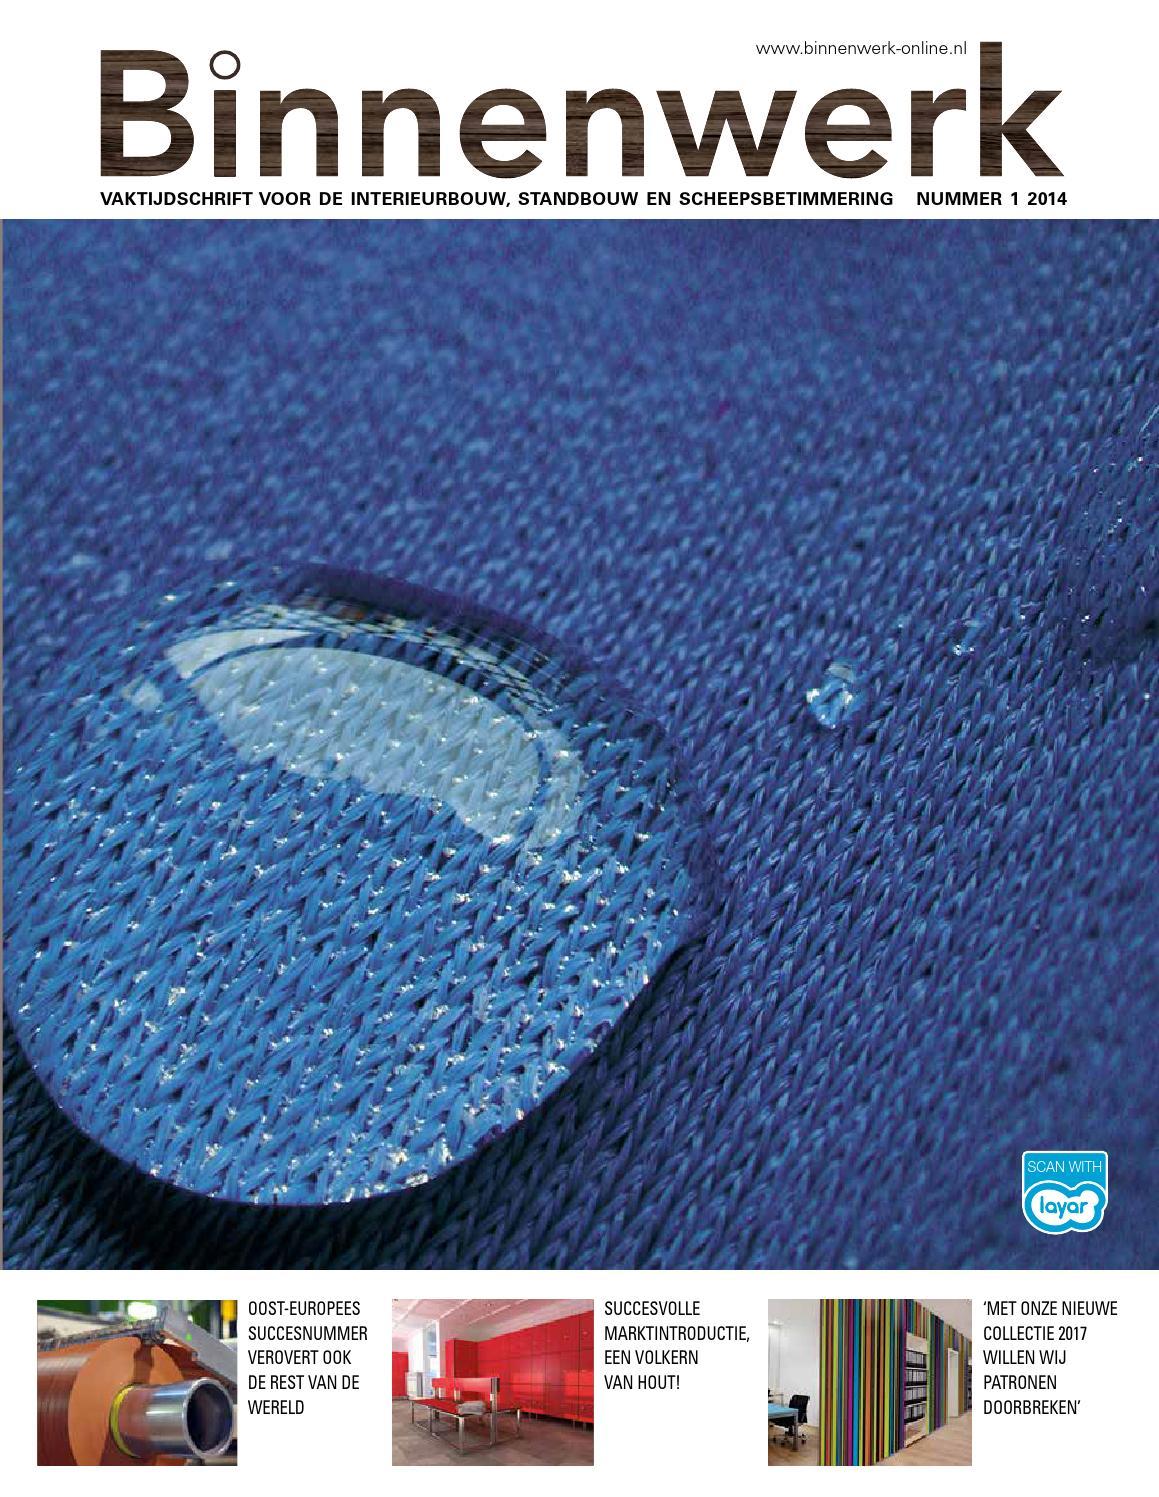 Binnenwerk 1 2014 By Louwers Uitgeversorganisatie Bv Issuu